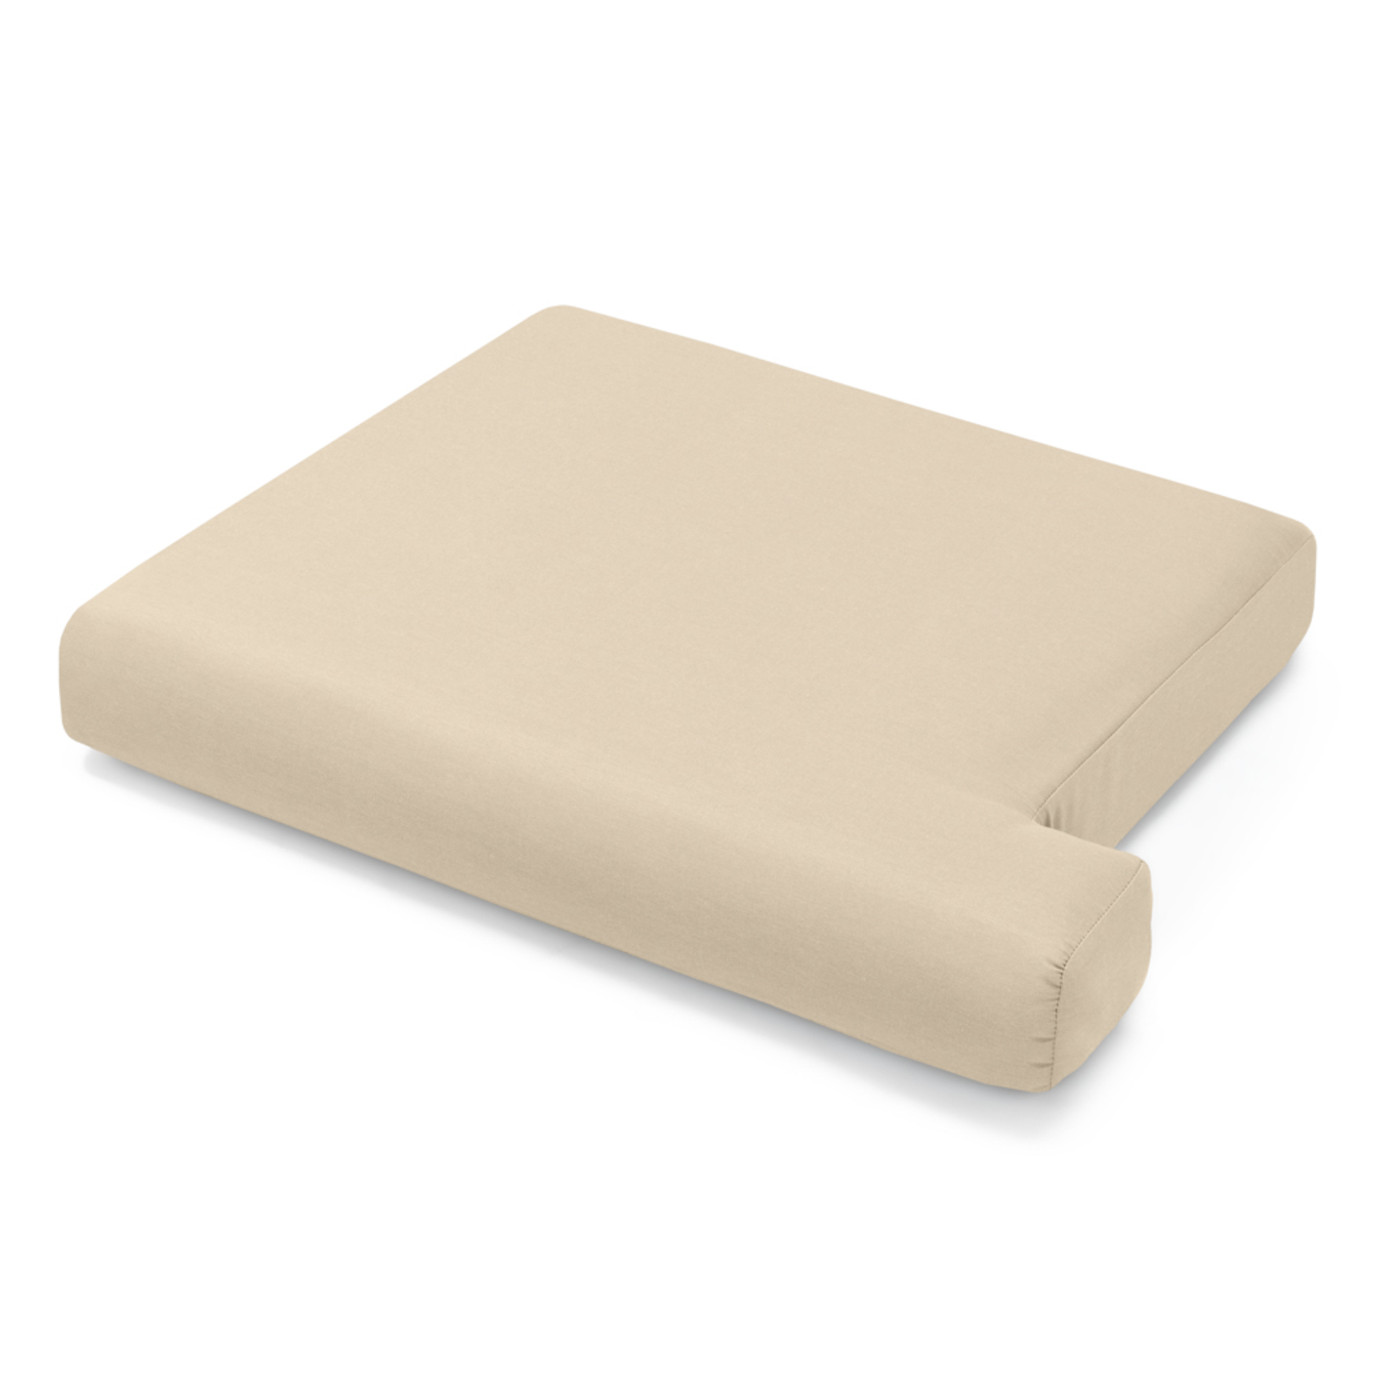 Portofino Comfort 71in Loveseat Left Base Cushion - Heather Beige